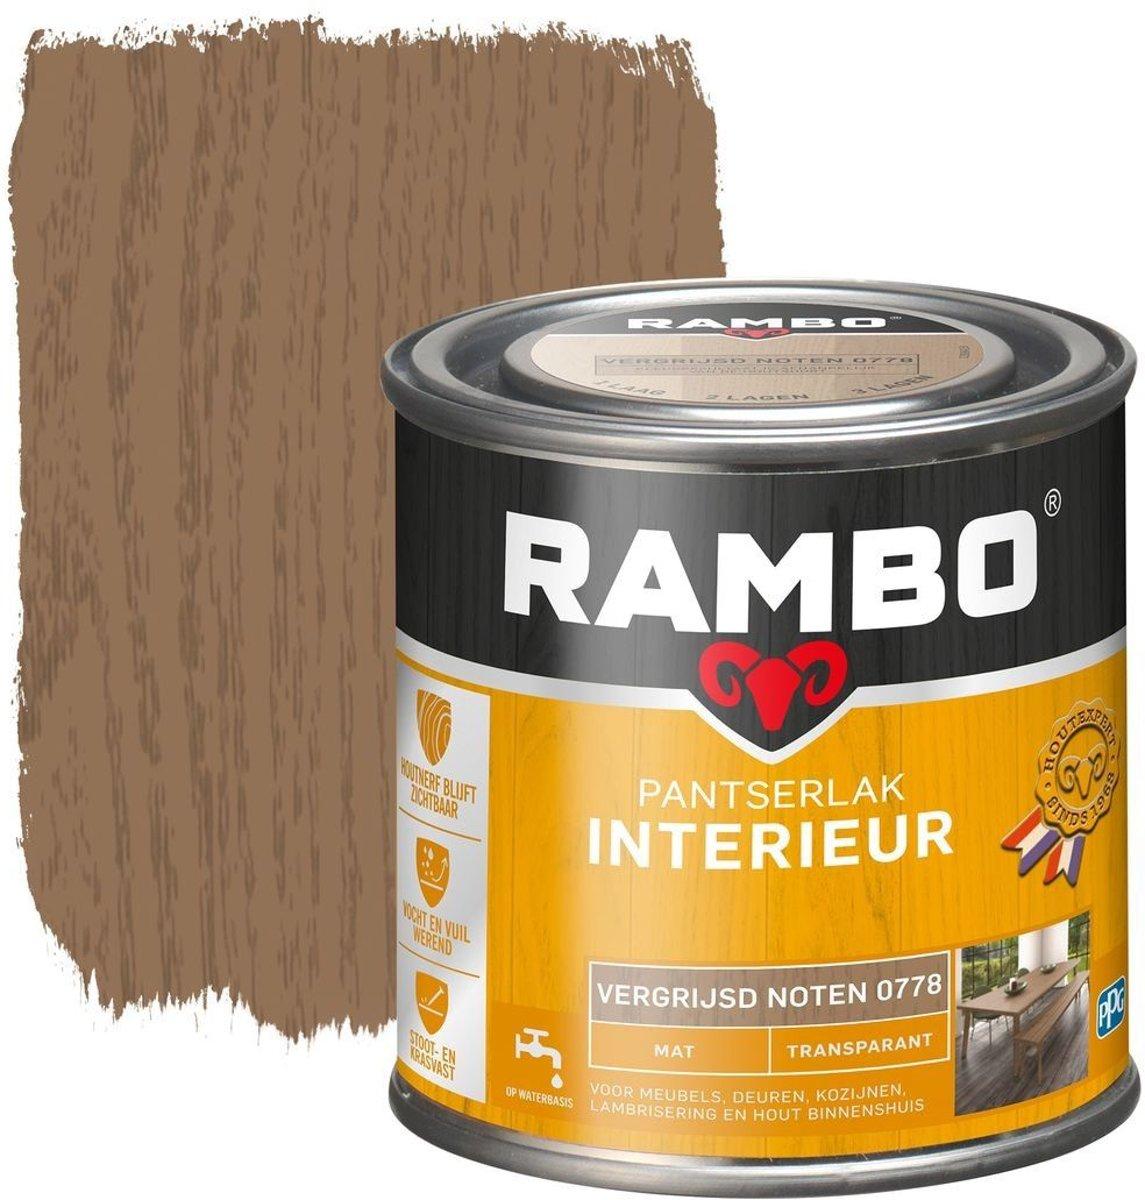 Rambo Pantserlak Interieur Transparant Mat Vergr.noten 0778-0,75 Ltr